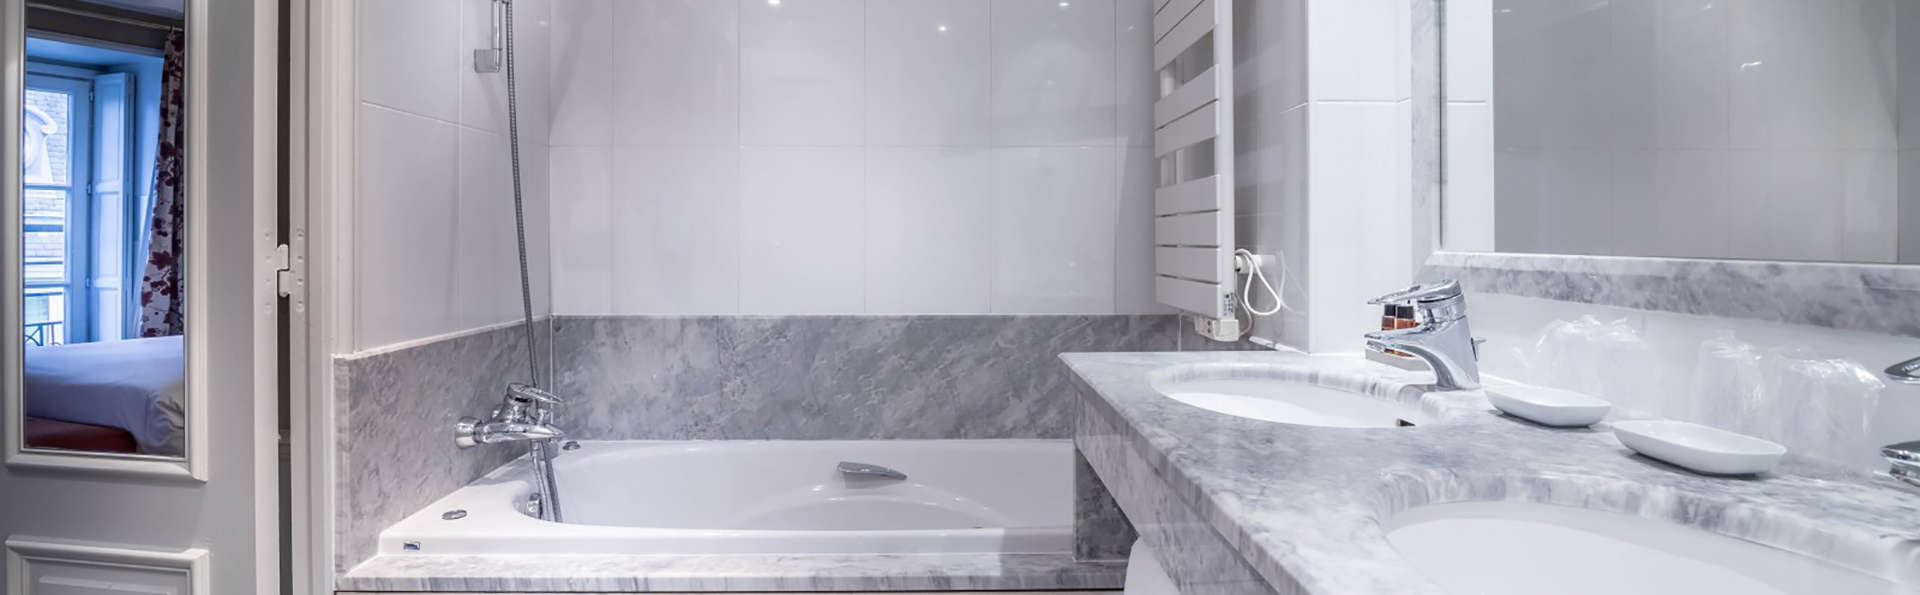 Hôtel Le Lavoisier - Edit_Bathroom.jpg